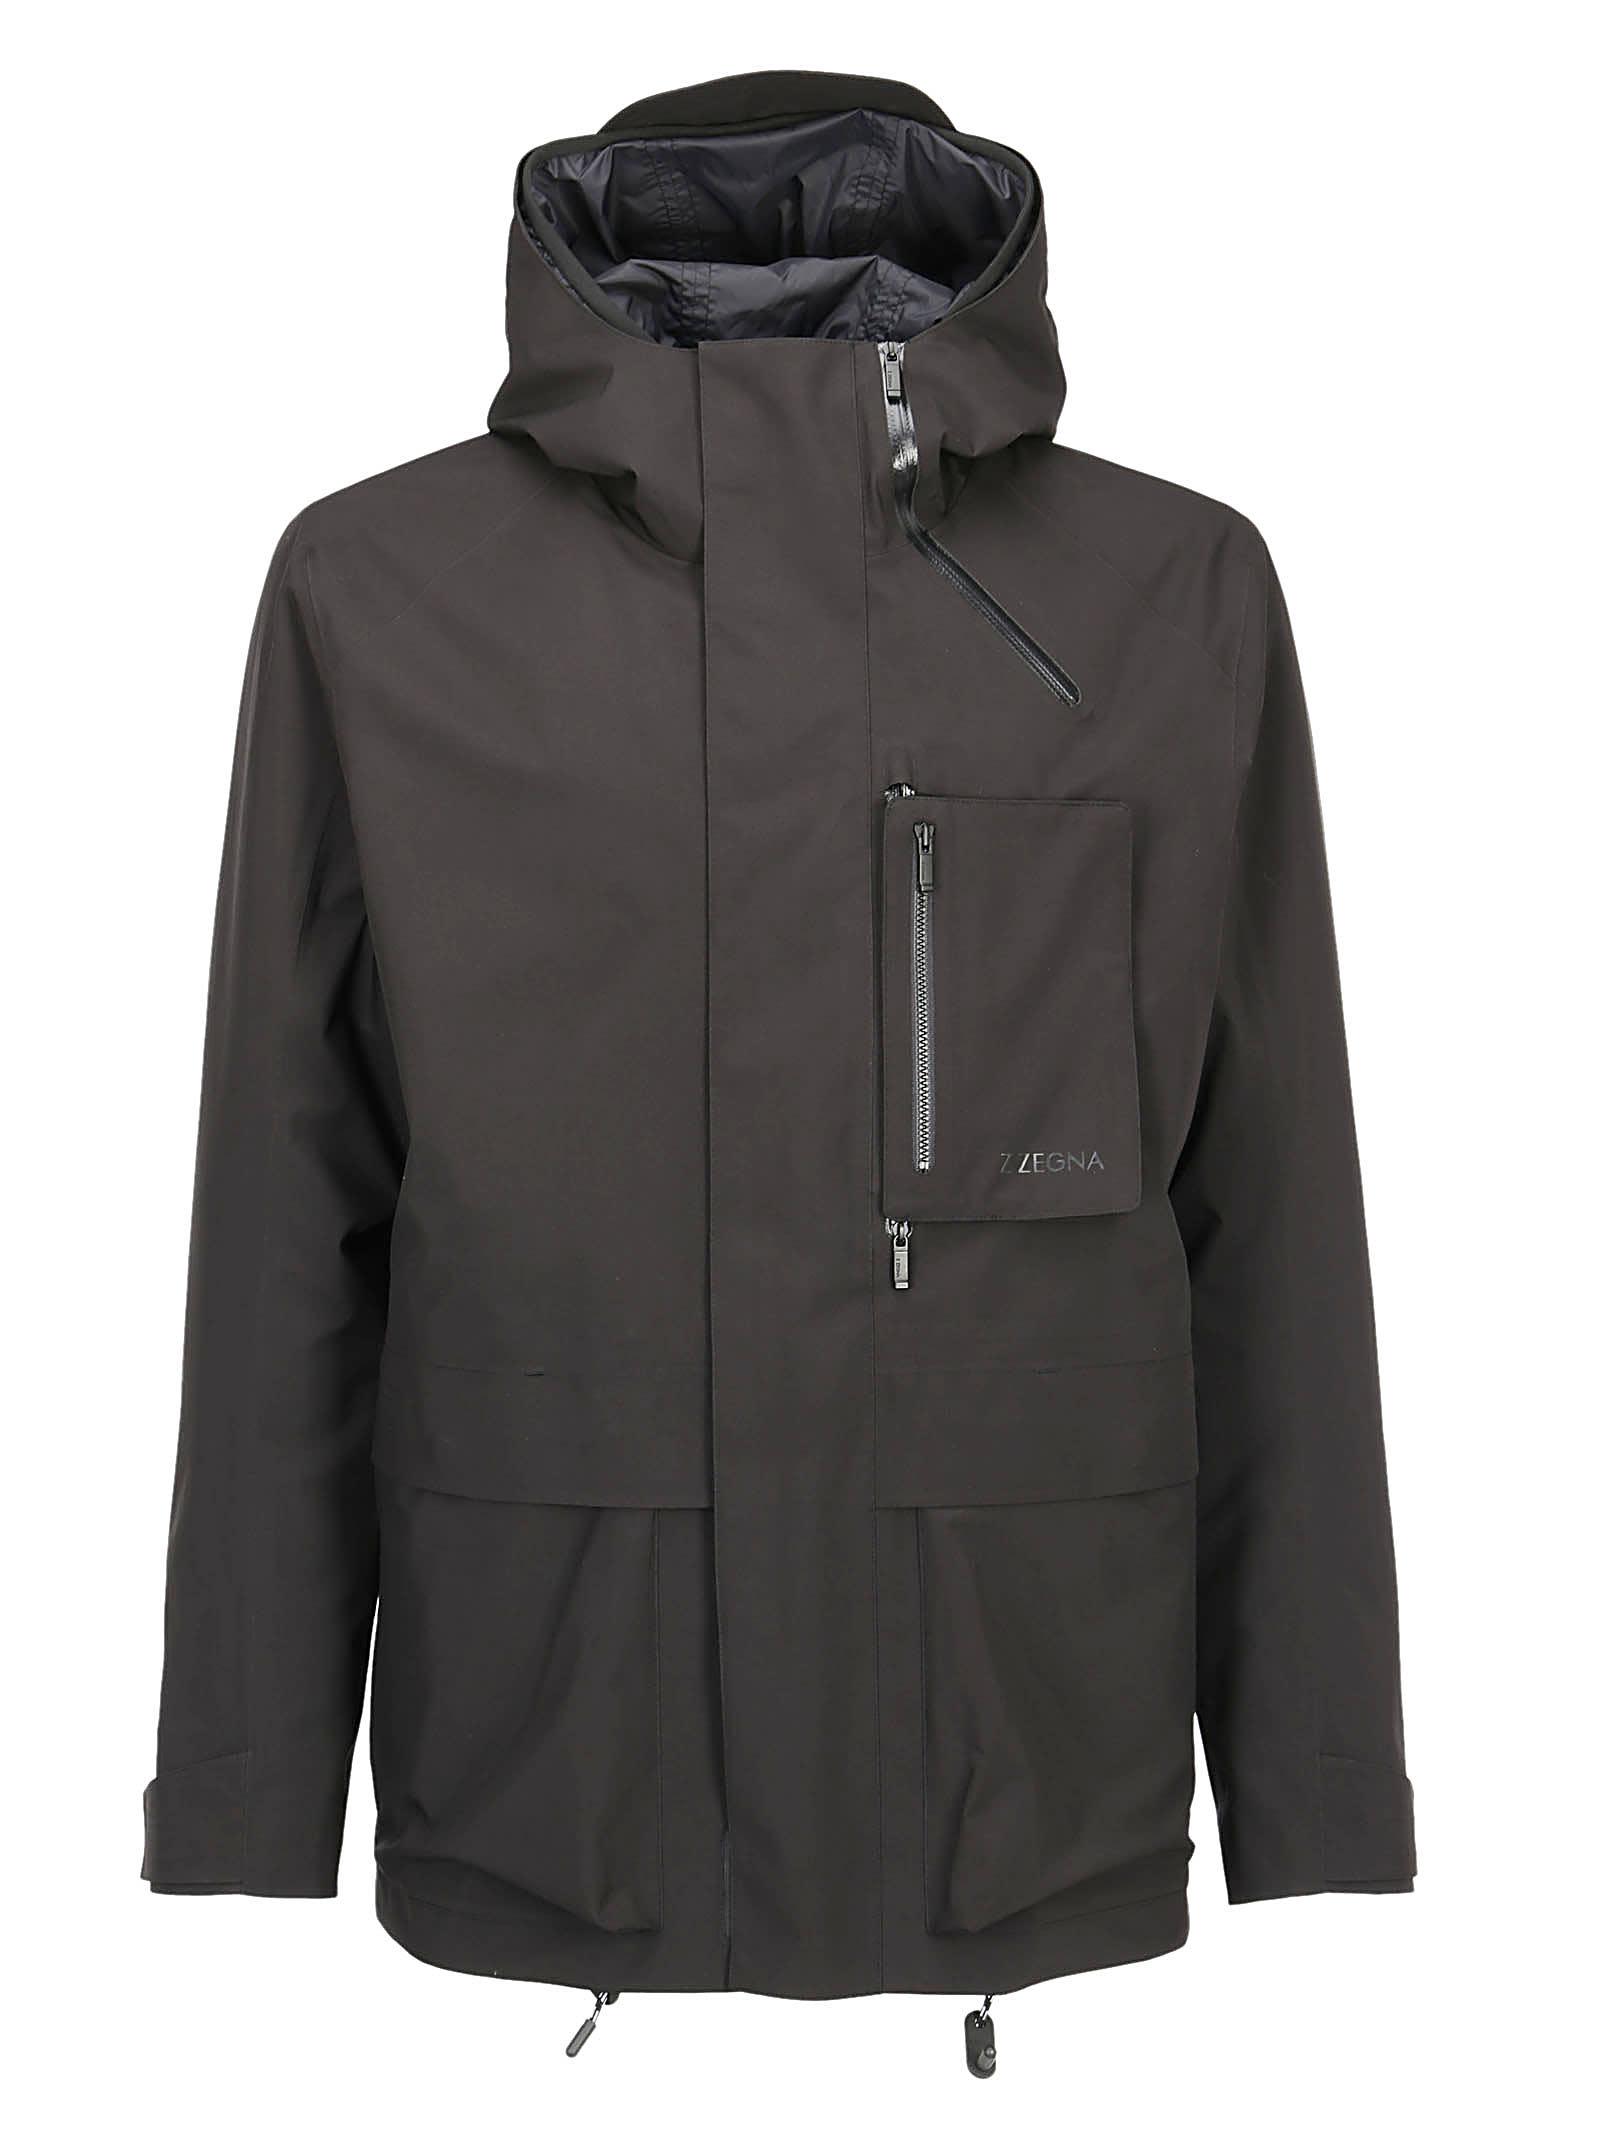 fed20bac Z Zegna Jacket